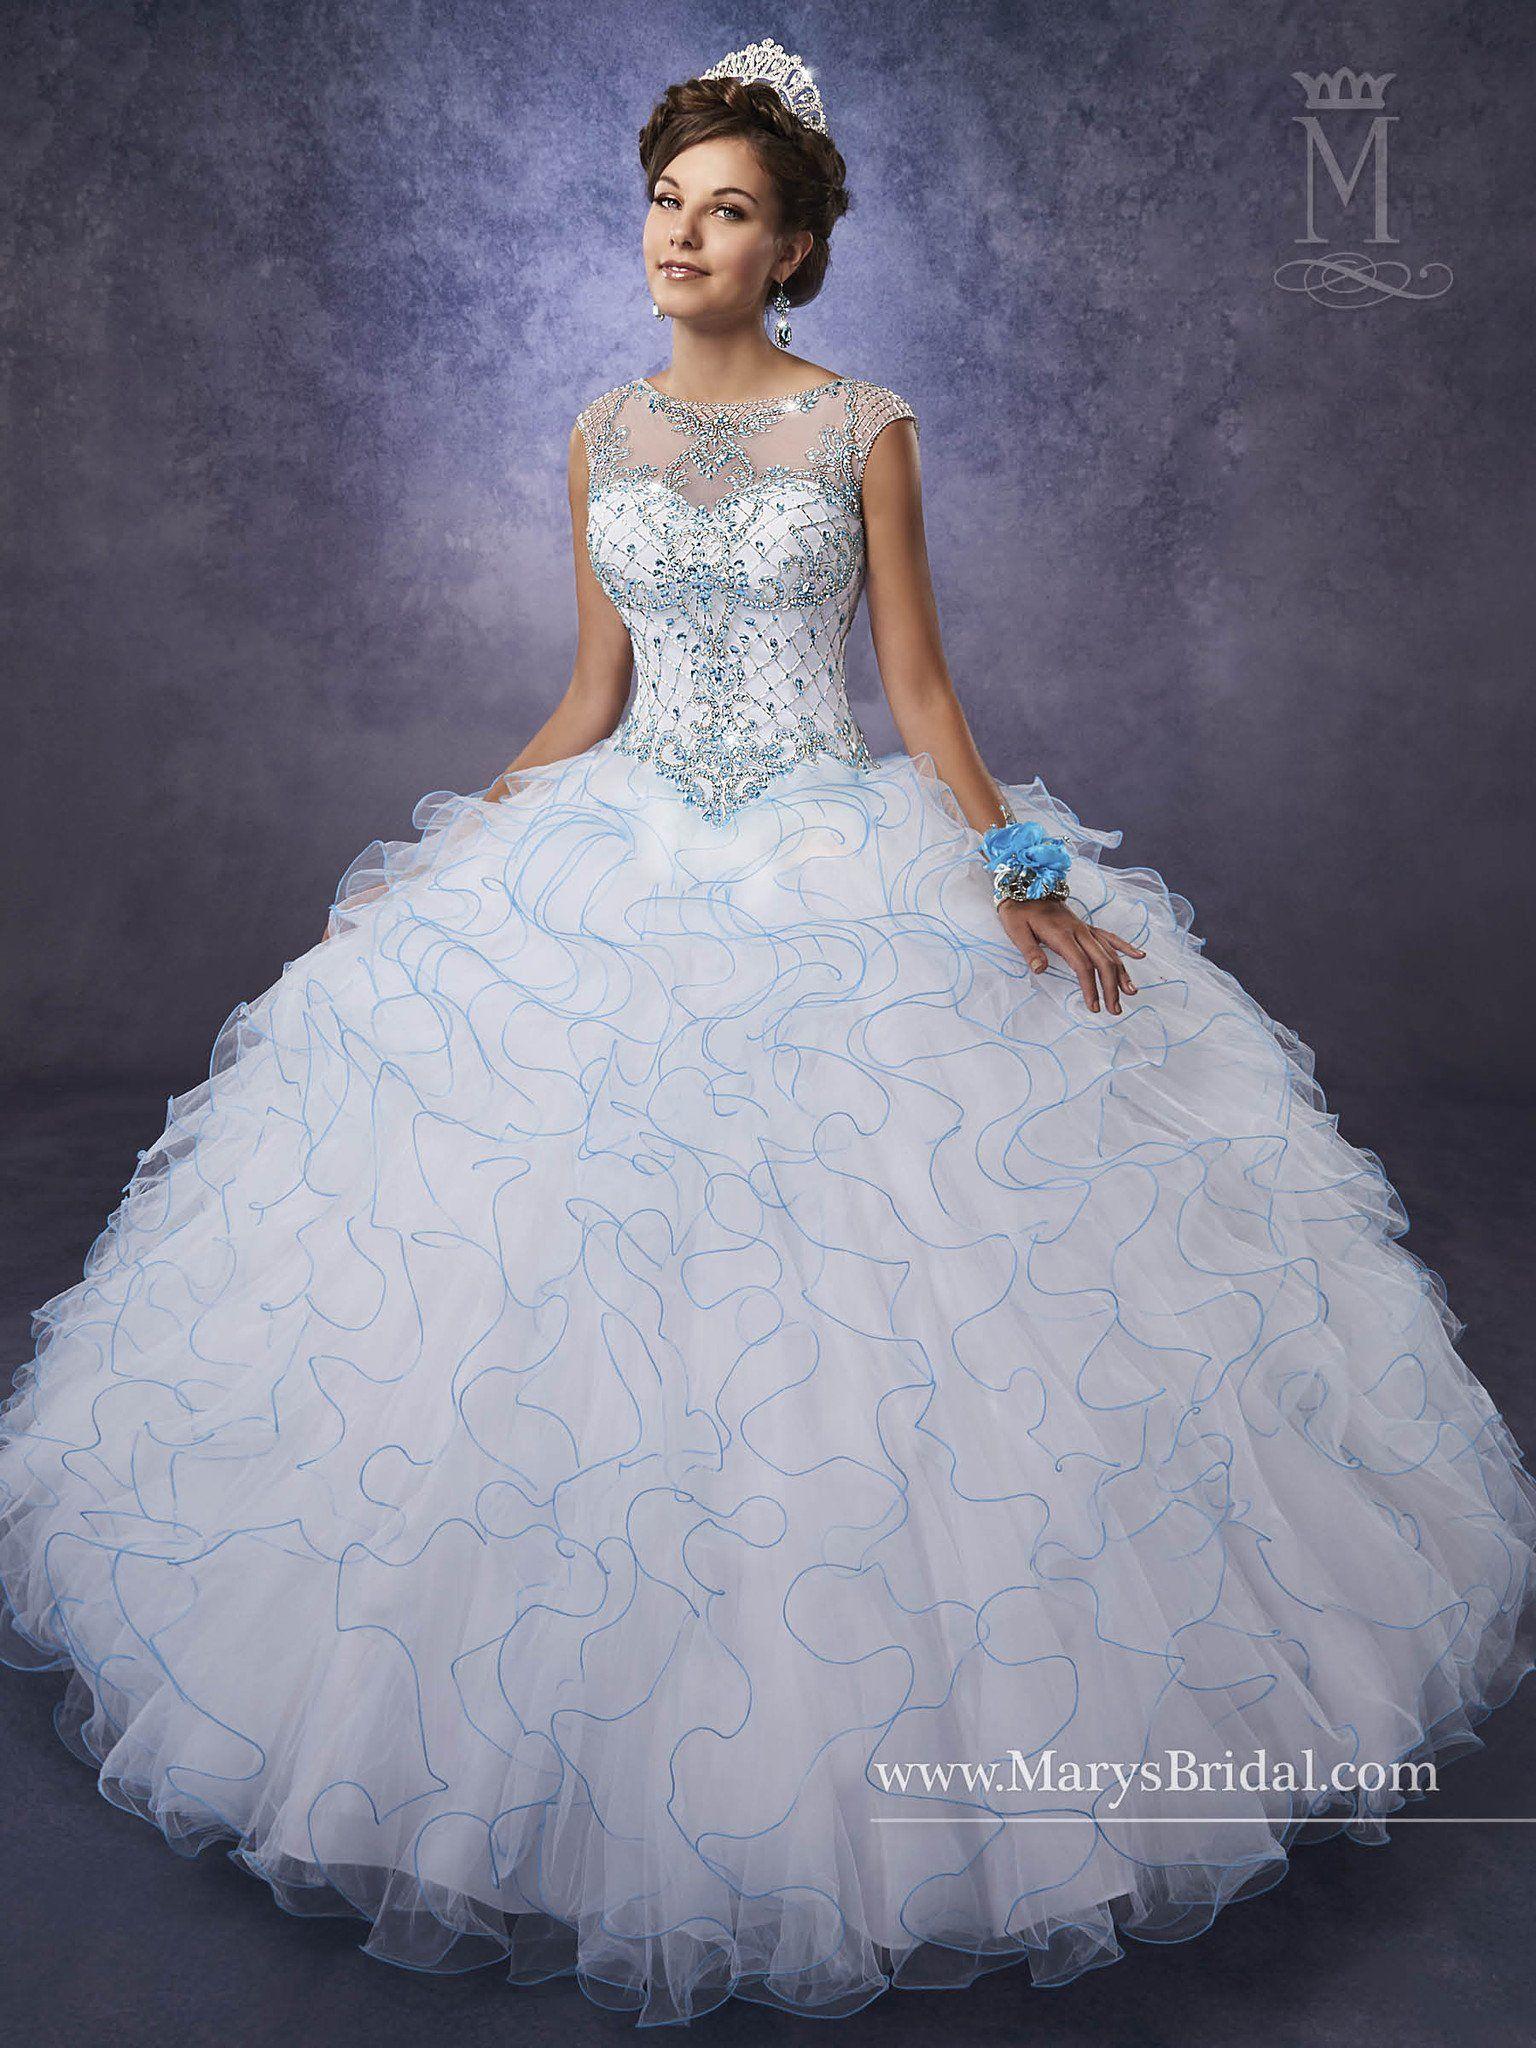 72aae107797 Princess Collection S17-4Q489 Marys Quinceanera - QuinceDresses.com   quincestyle  misquinces  quincelebrations  morileedress  quinceaneradress   ombredress ...